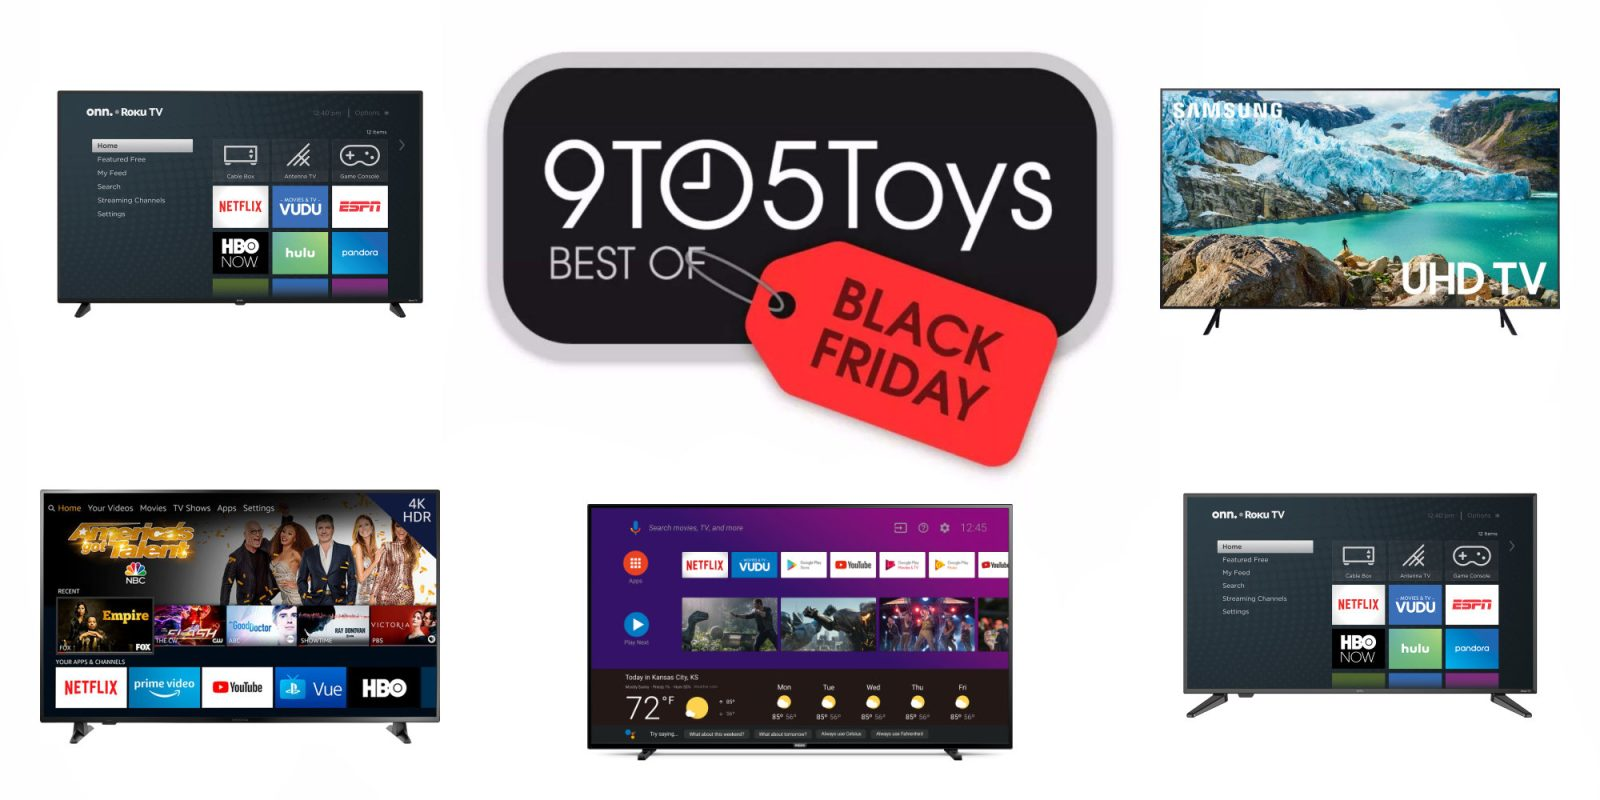 Best of Black Friday 2019 – TVs: 58-inch 4K $198, 70-inch Samsung $550, more